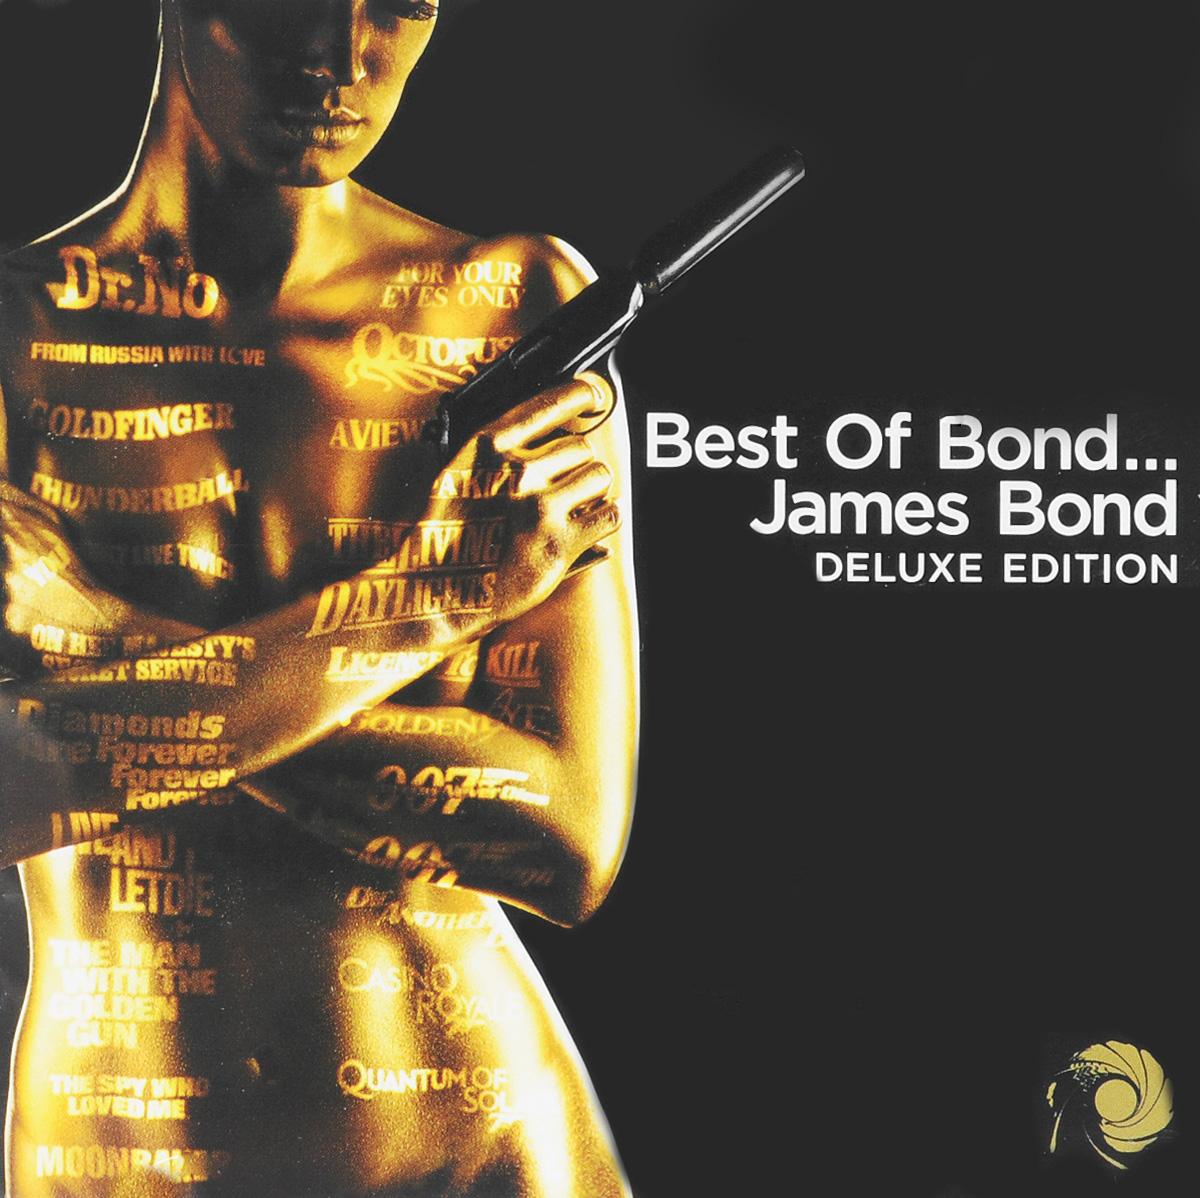 Best Of Bond... James Bond. Deluxe Edition (2 CD)